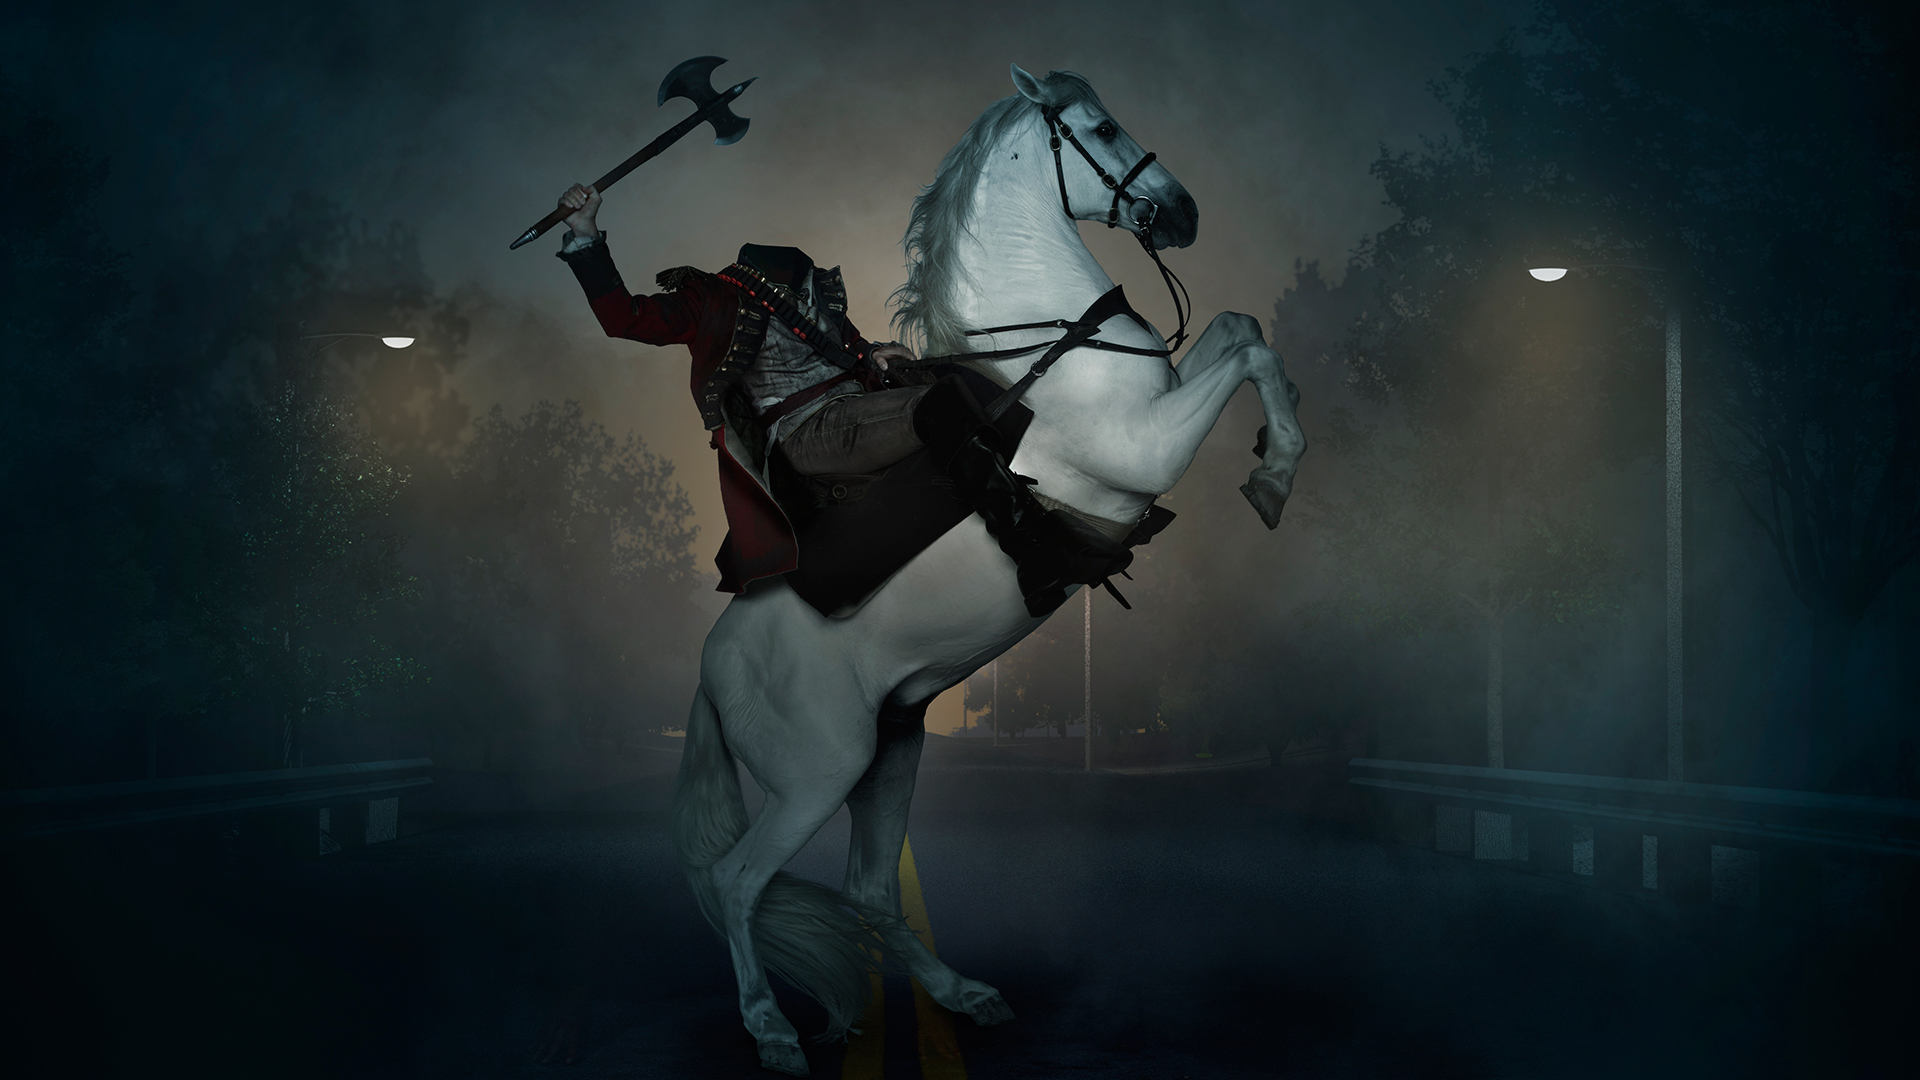 Headless Horseman (Legend of Sleepy Hollow)